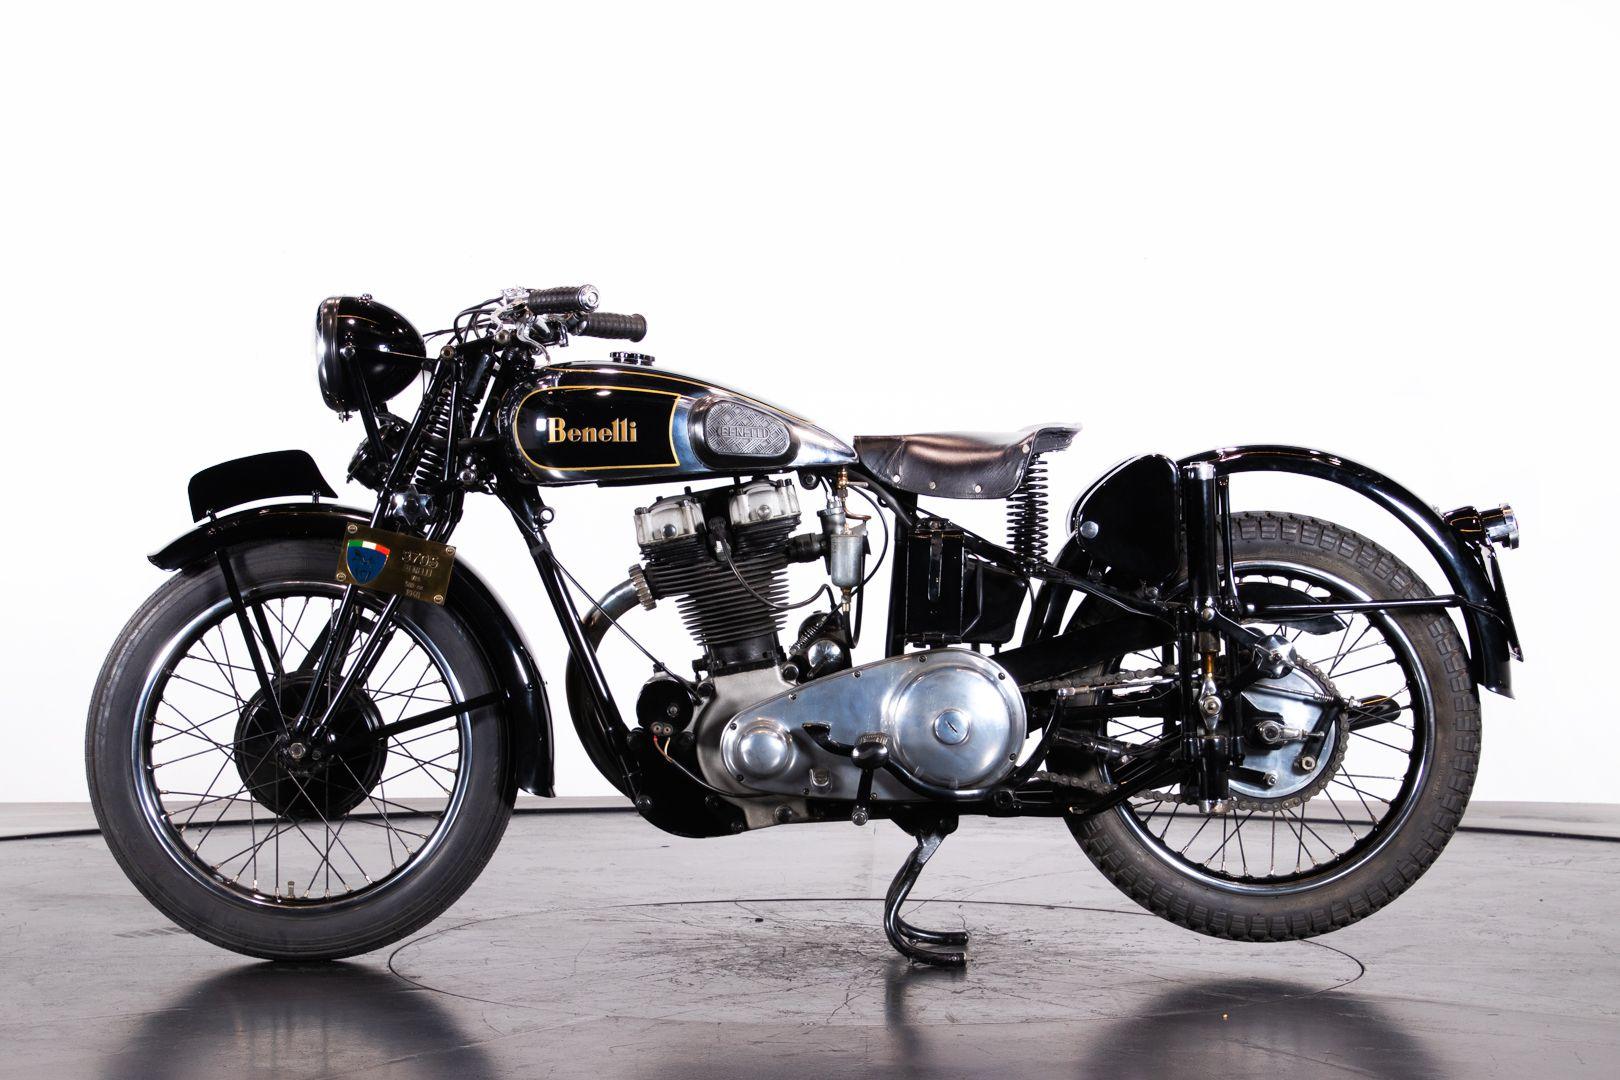 1940 Benelli VTA 32412